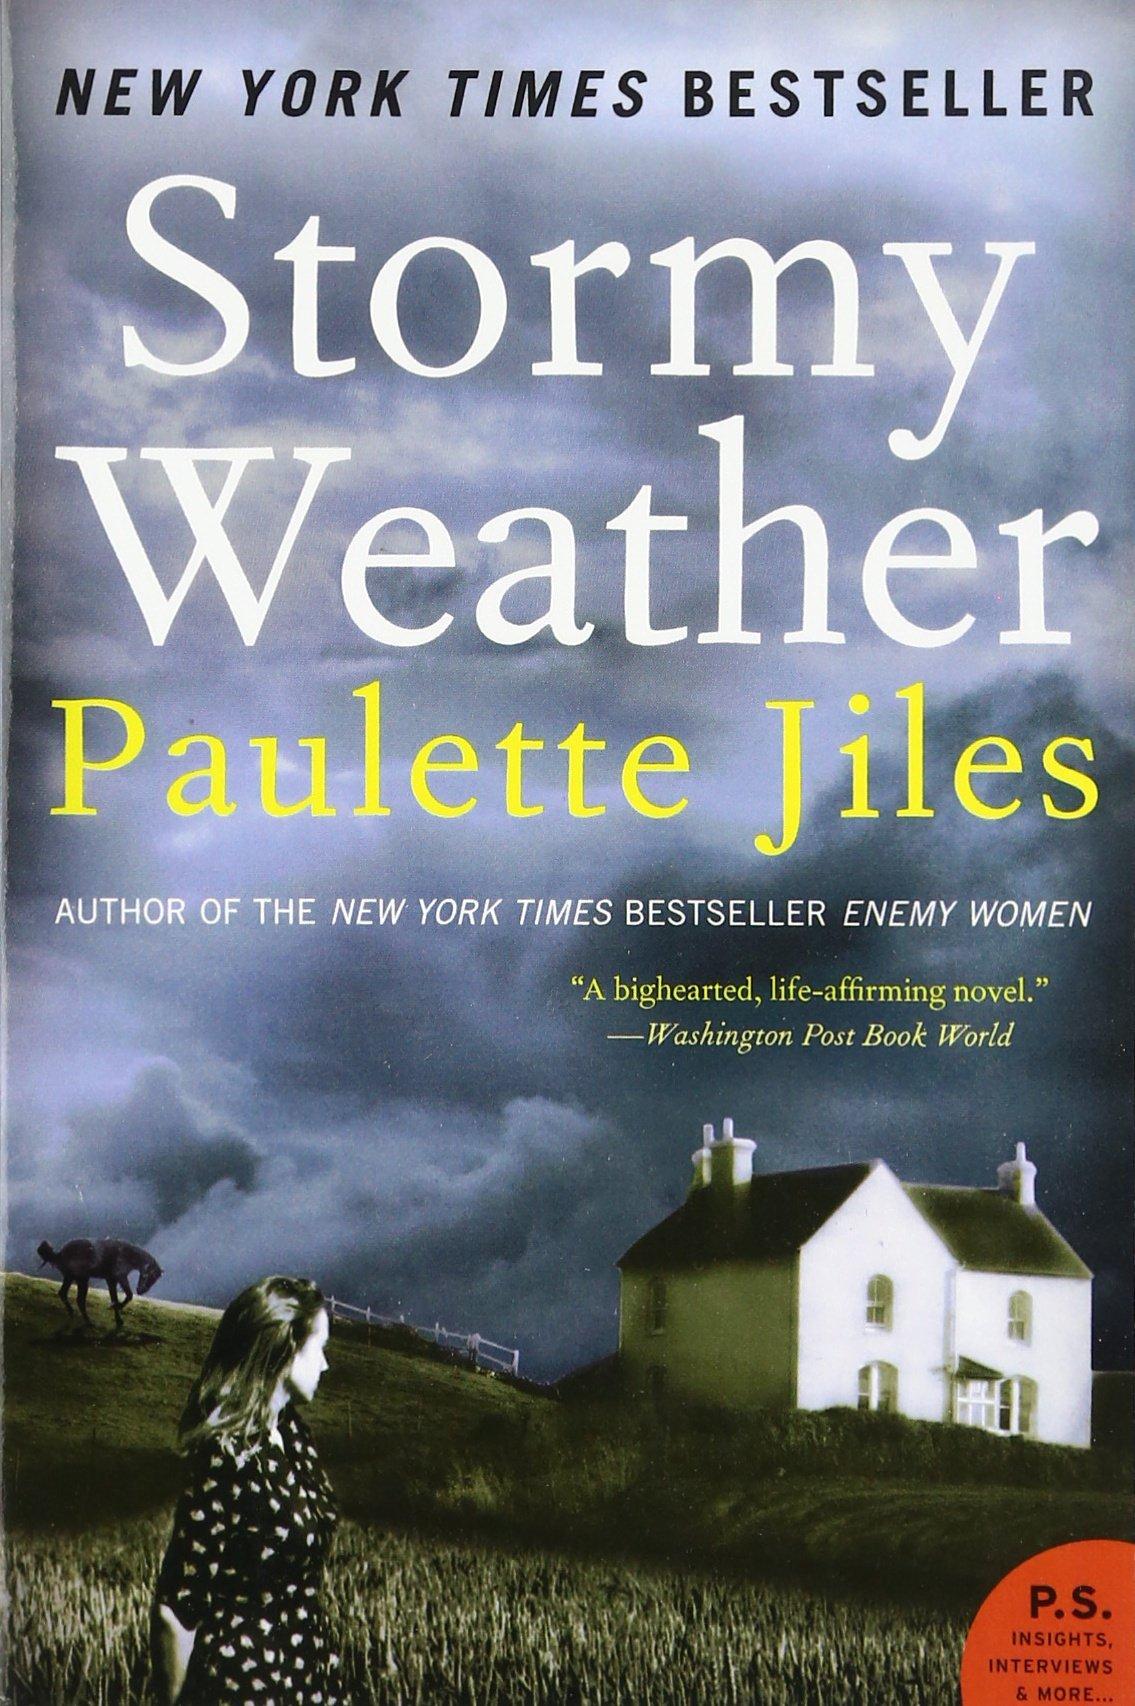 Stormy Weather: A Novel: Paulette Jiles: 9780060537333: Amazon: Books